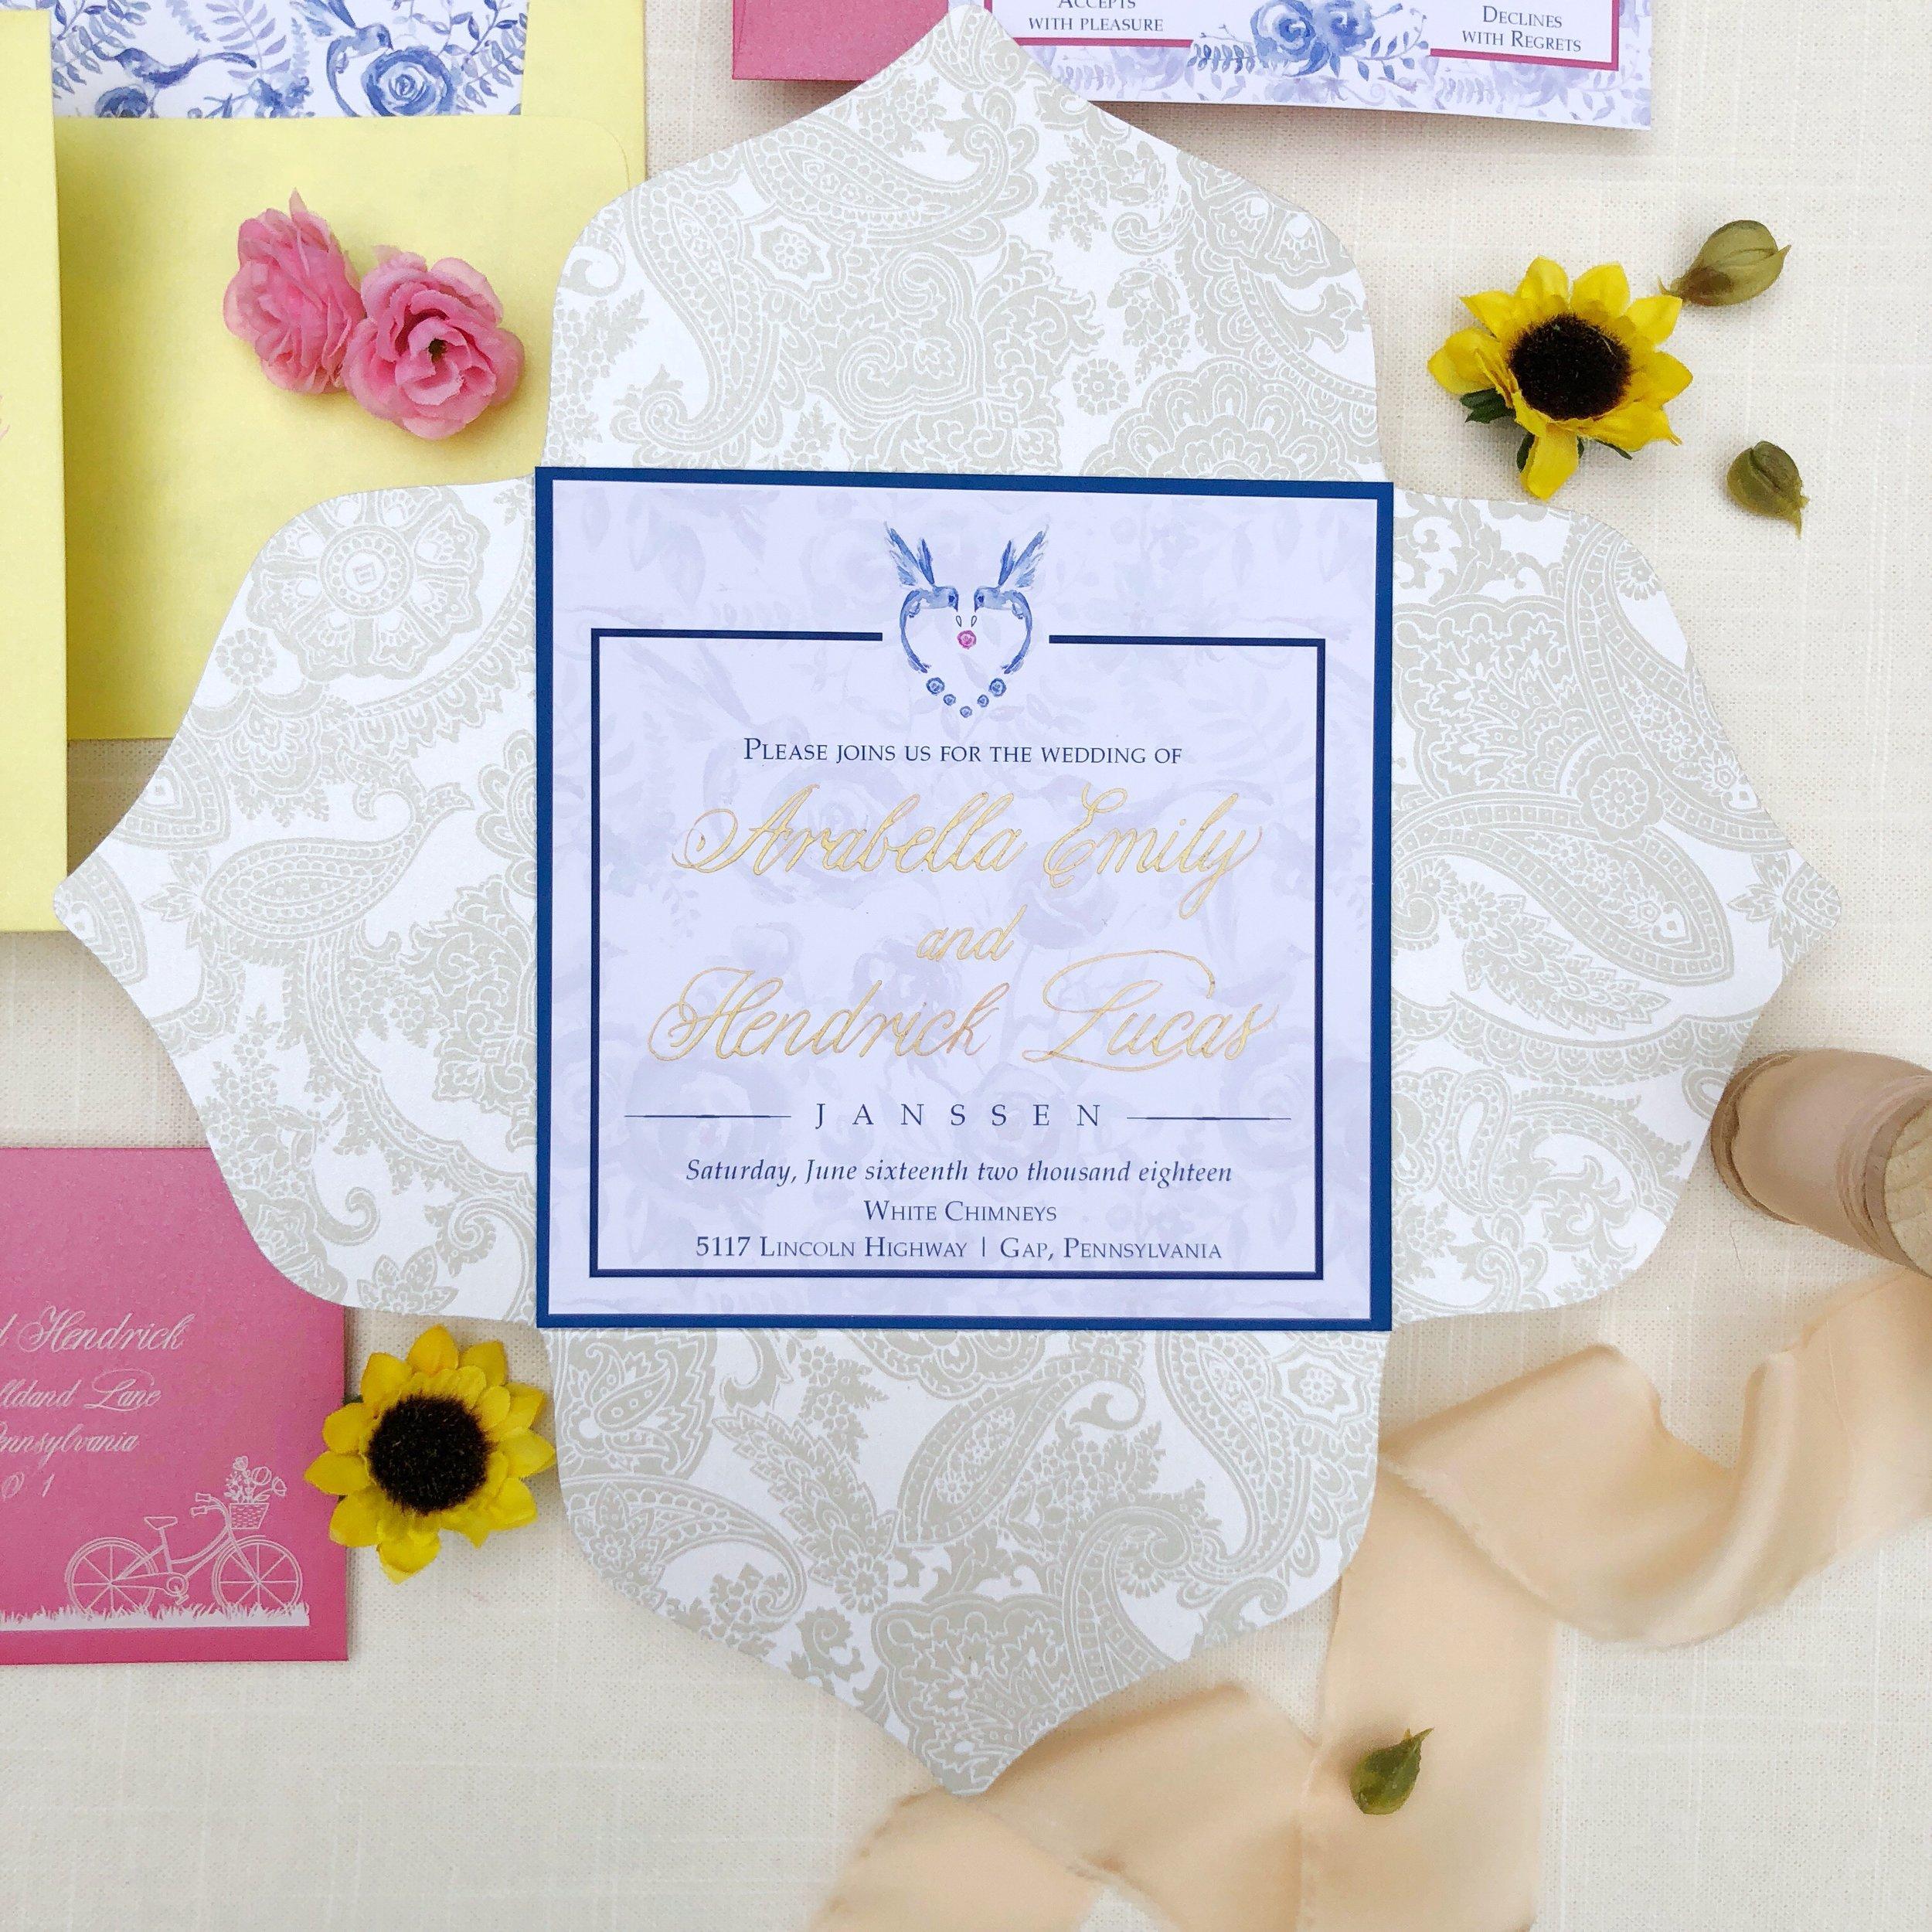 Central PA, York PA, JesSmith Designs, custom, wedding, invitations, bridal, announcements, save the date, baby, hanover, calligraphy, baltimore, wedding invitations, lancaster, gettysburg-05-20 16.28.26.jpg